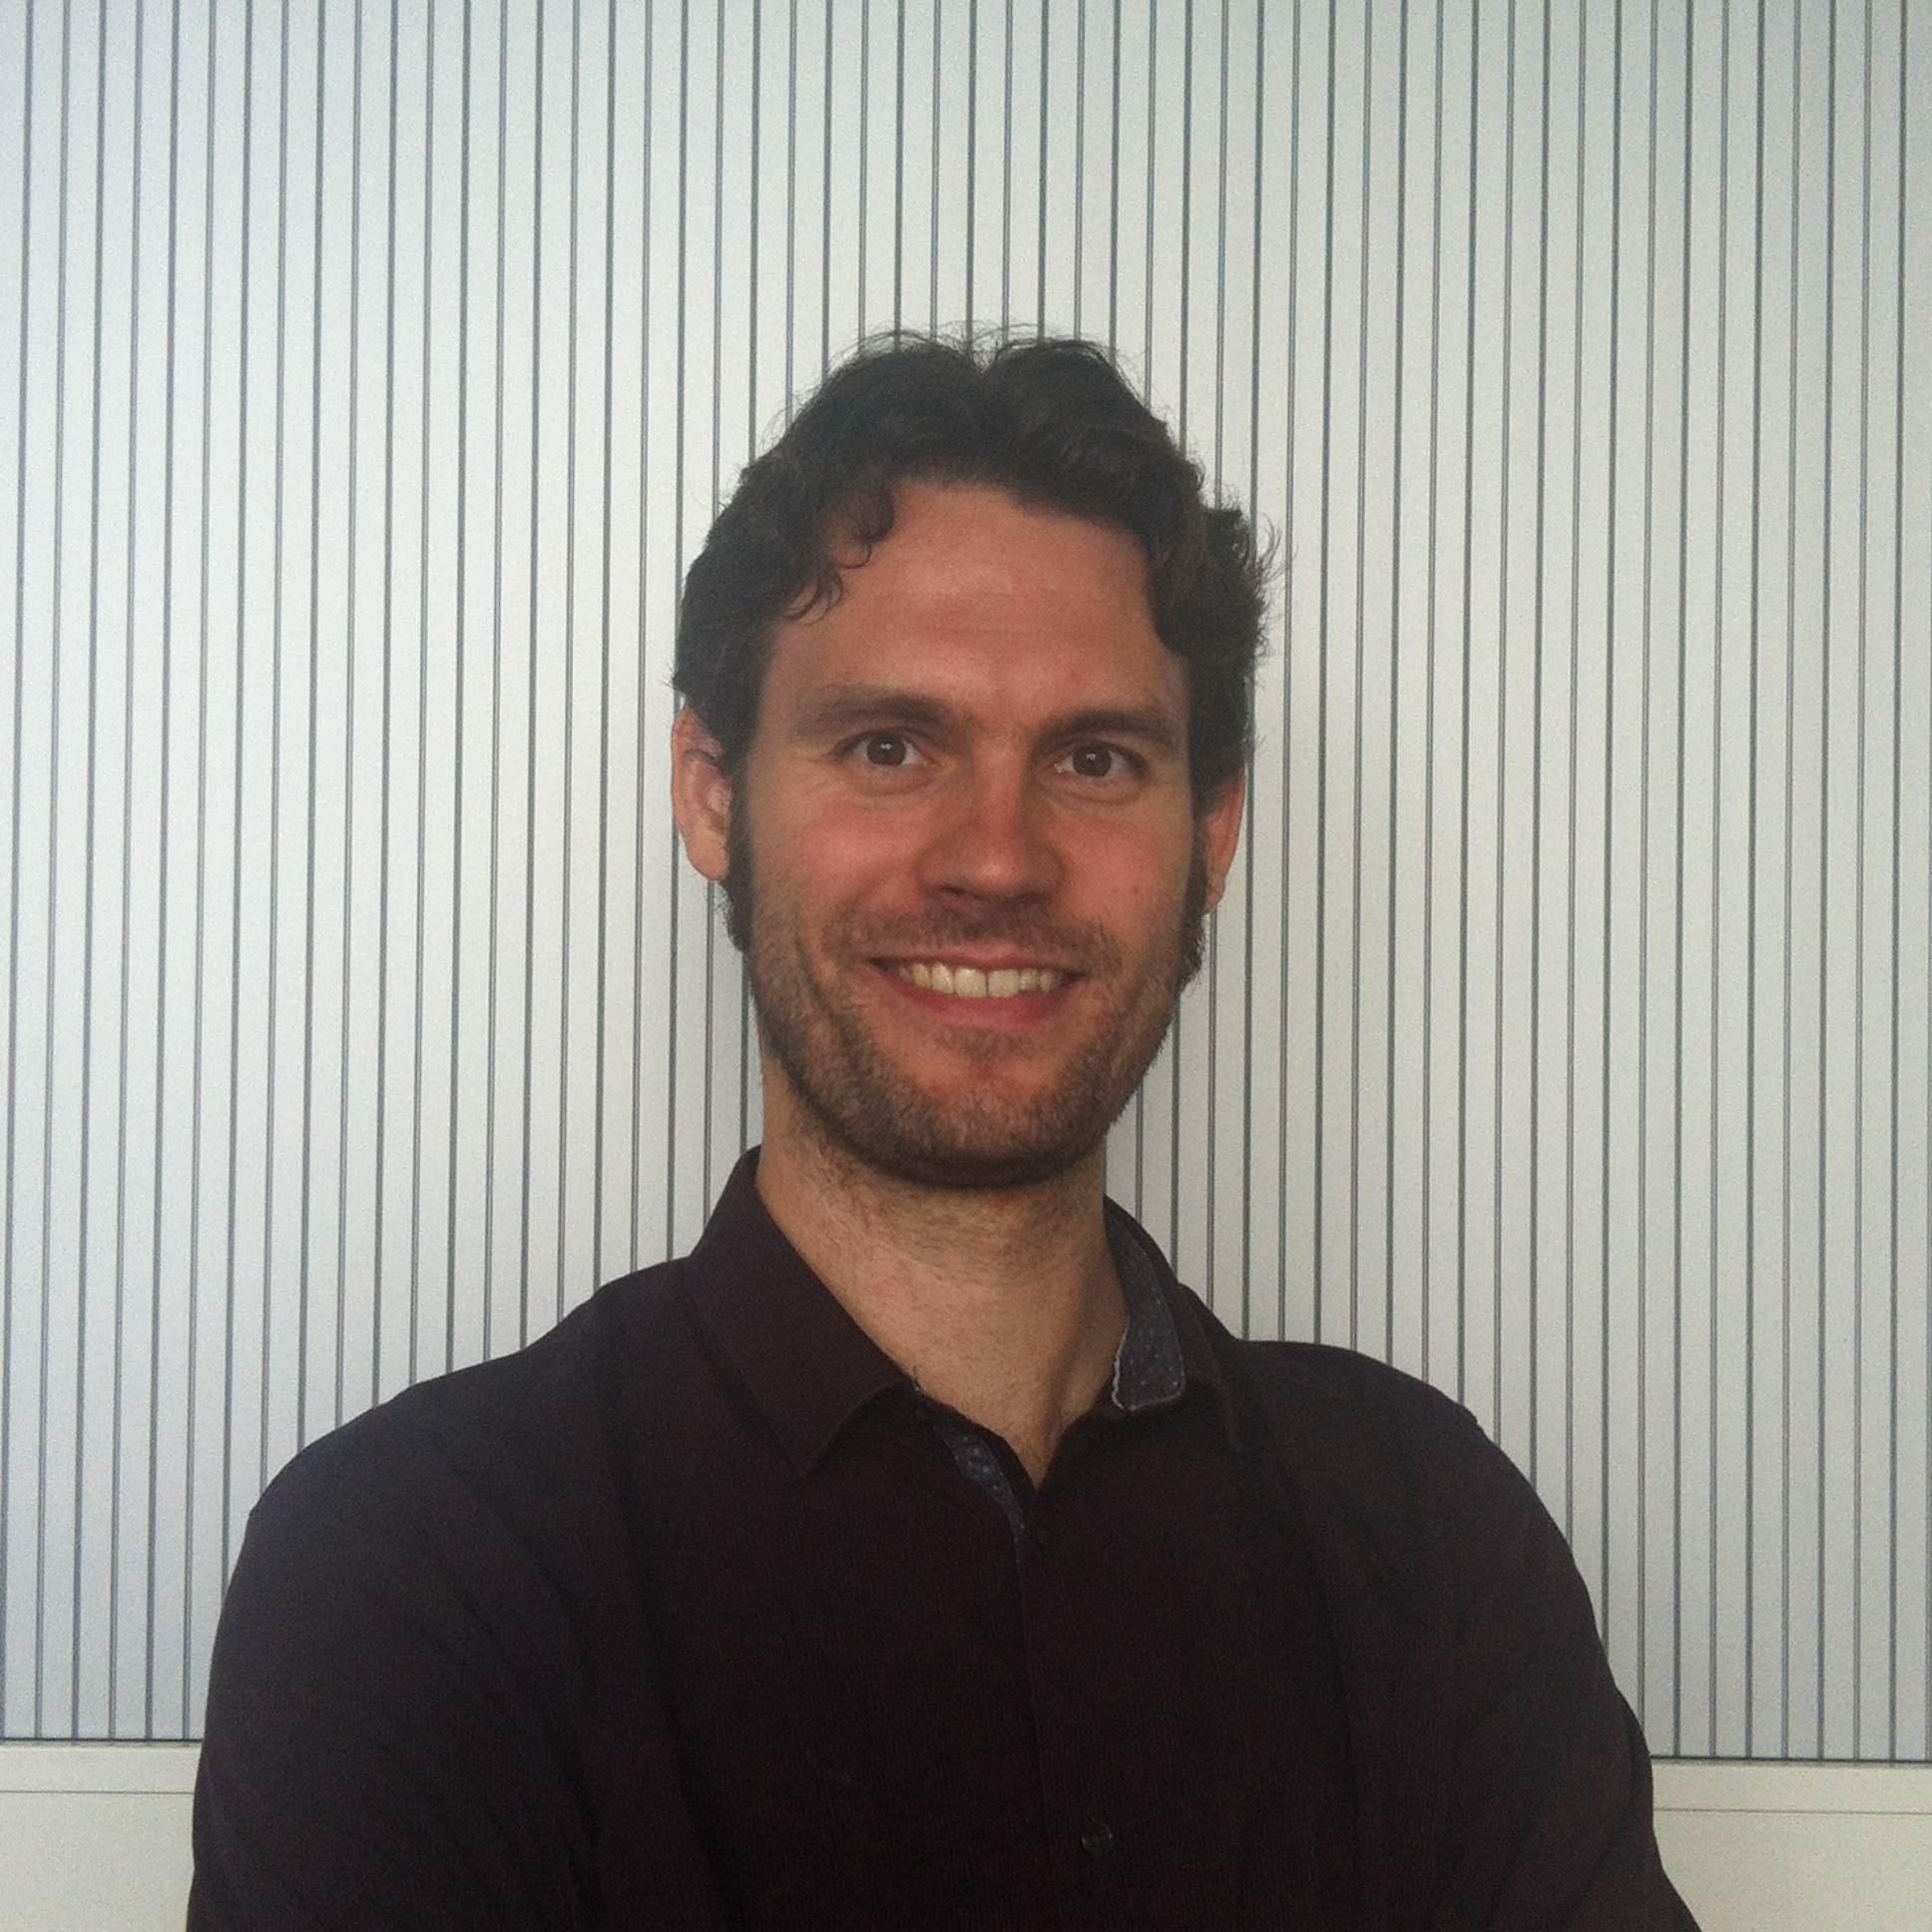 Andrew Wagner